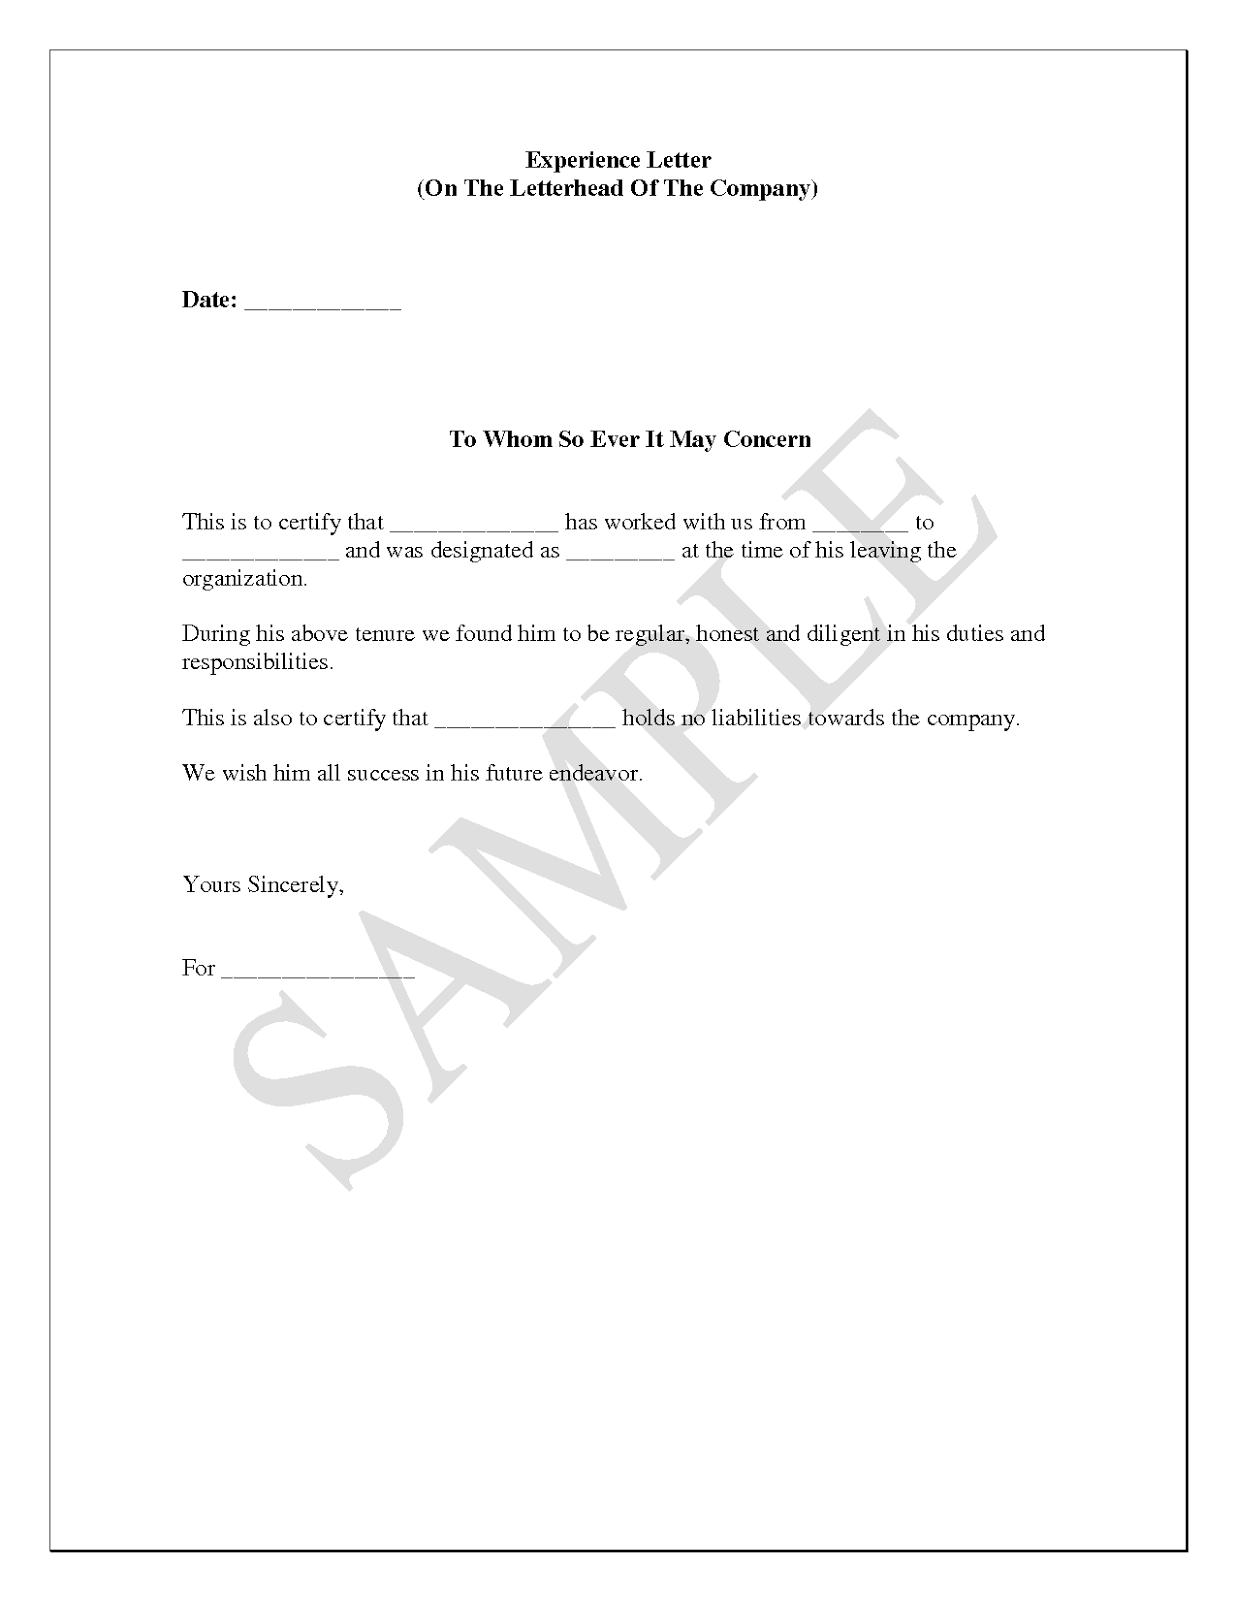 Salary certificate format fieldstation salary certificate format yelopaper Gallery